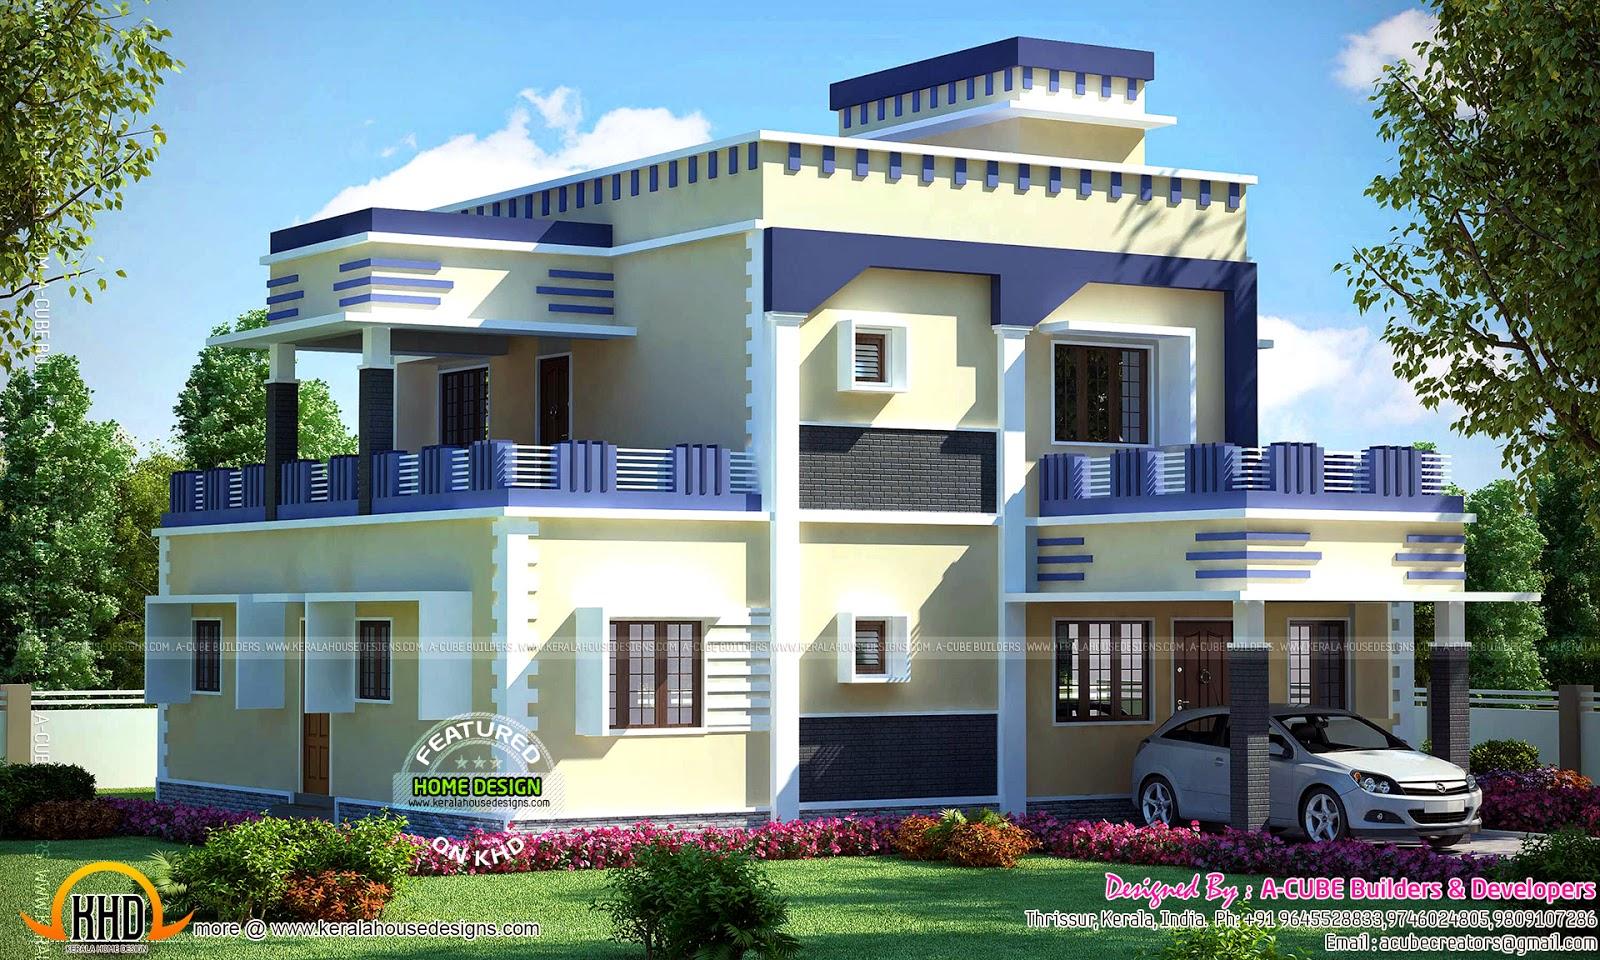 Decorative Flat Roof : Flat roof house decorative elements kerala home design